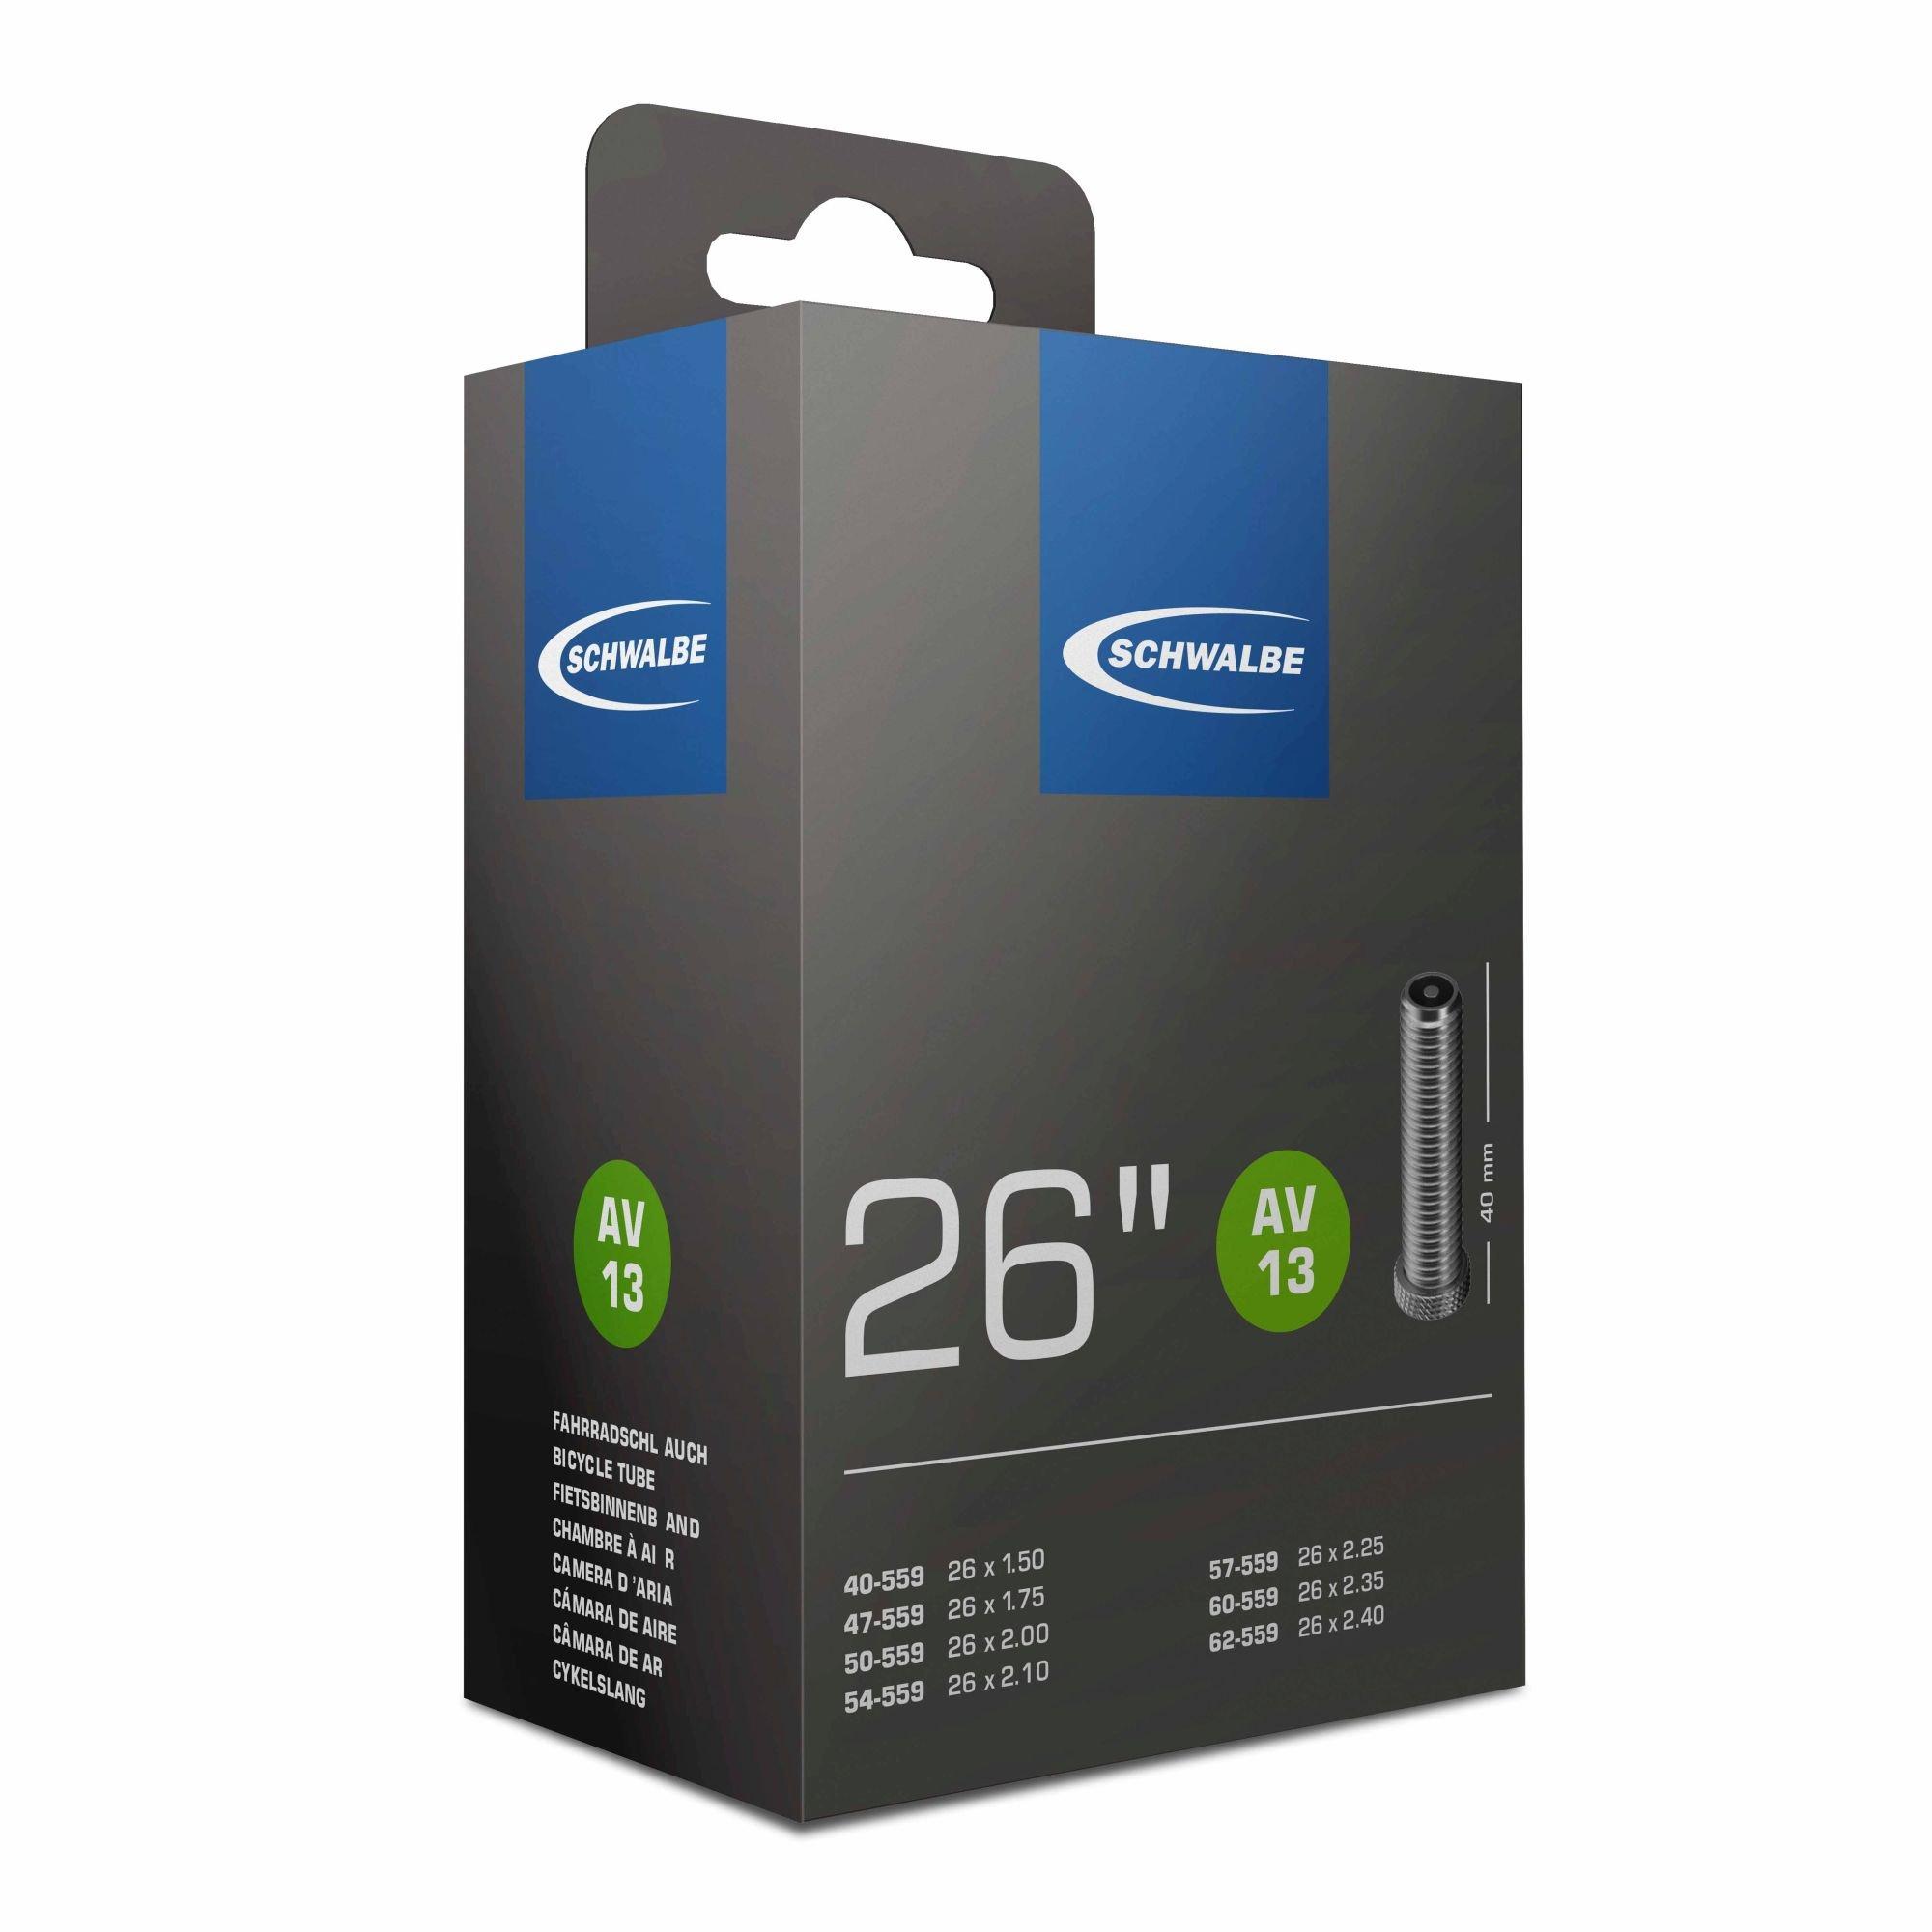 schläuche/Bereifung: Schwalbe  Fahrradschlauch AV 13  40mm